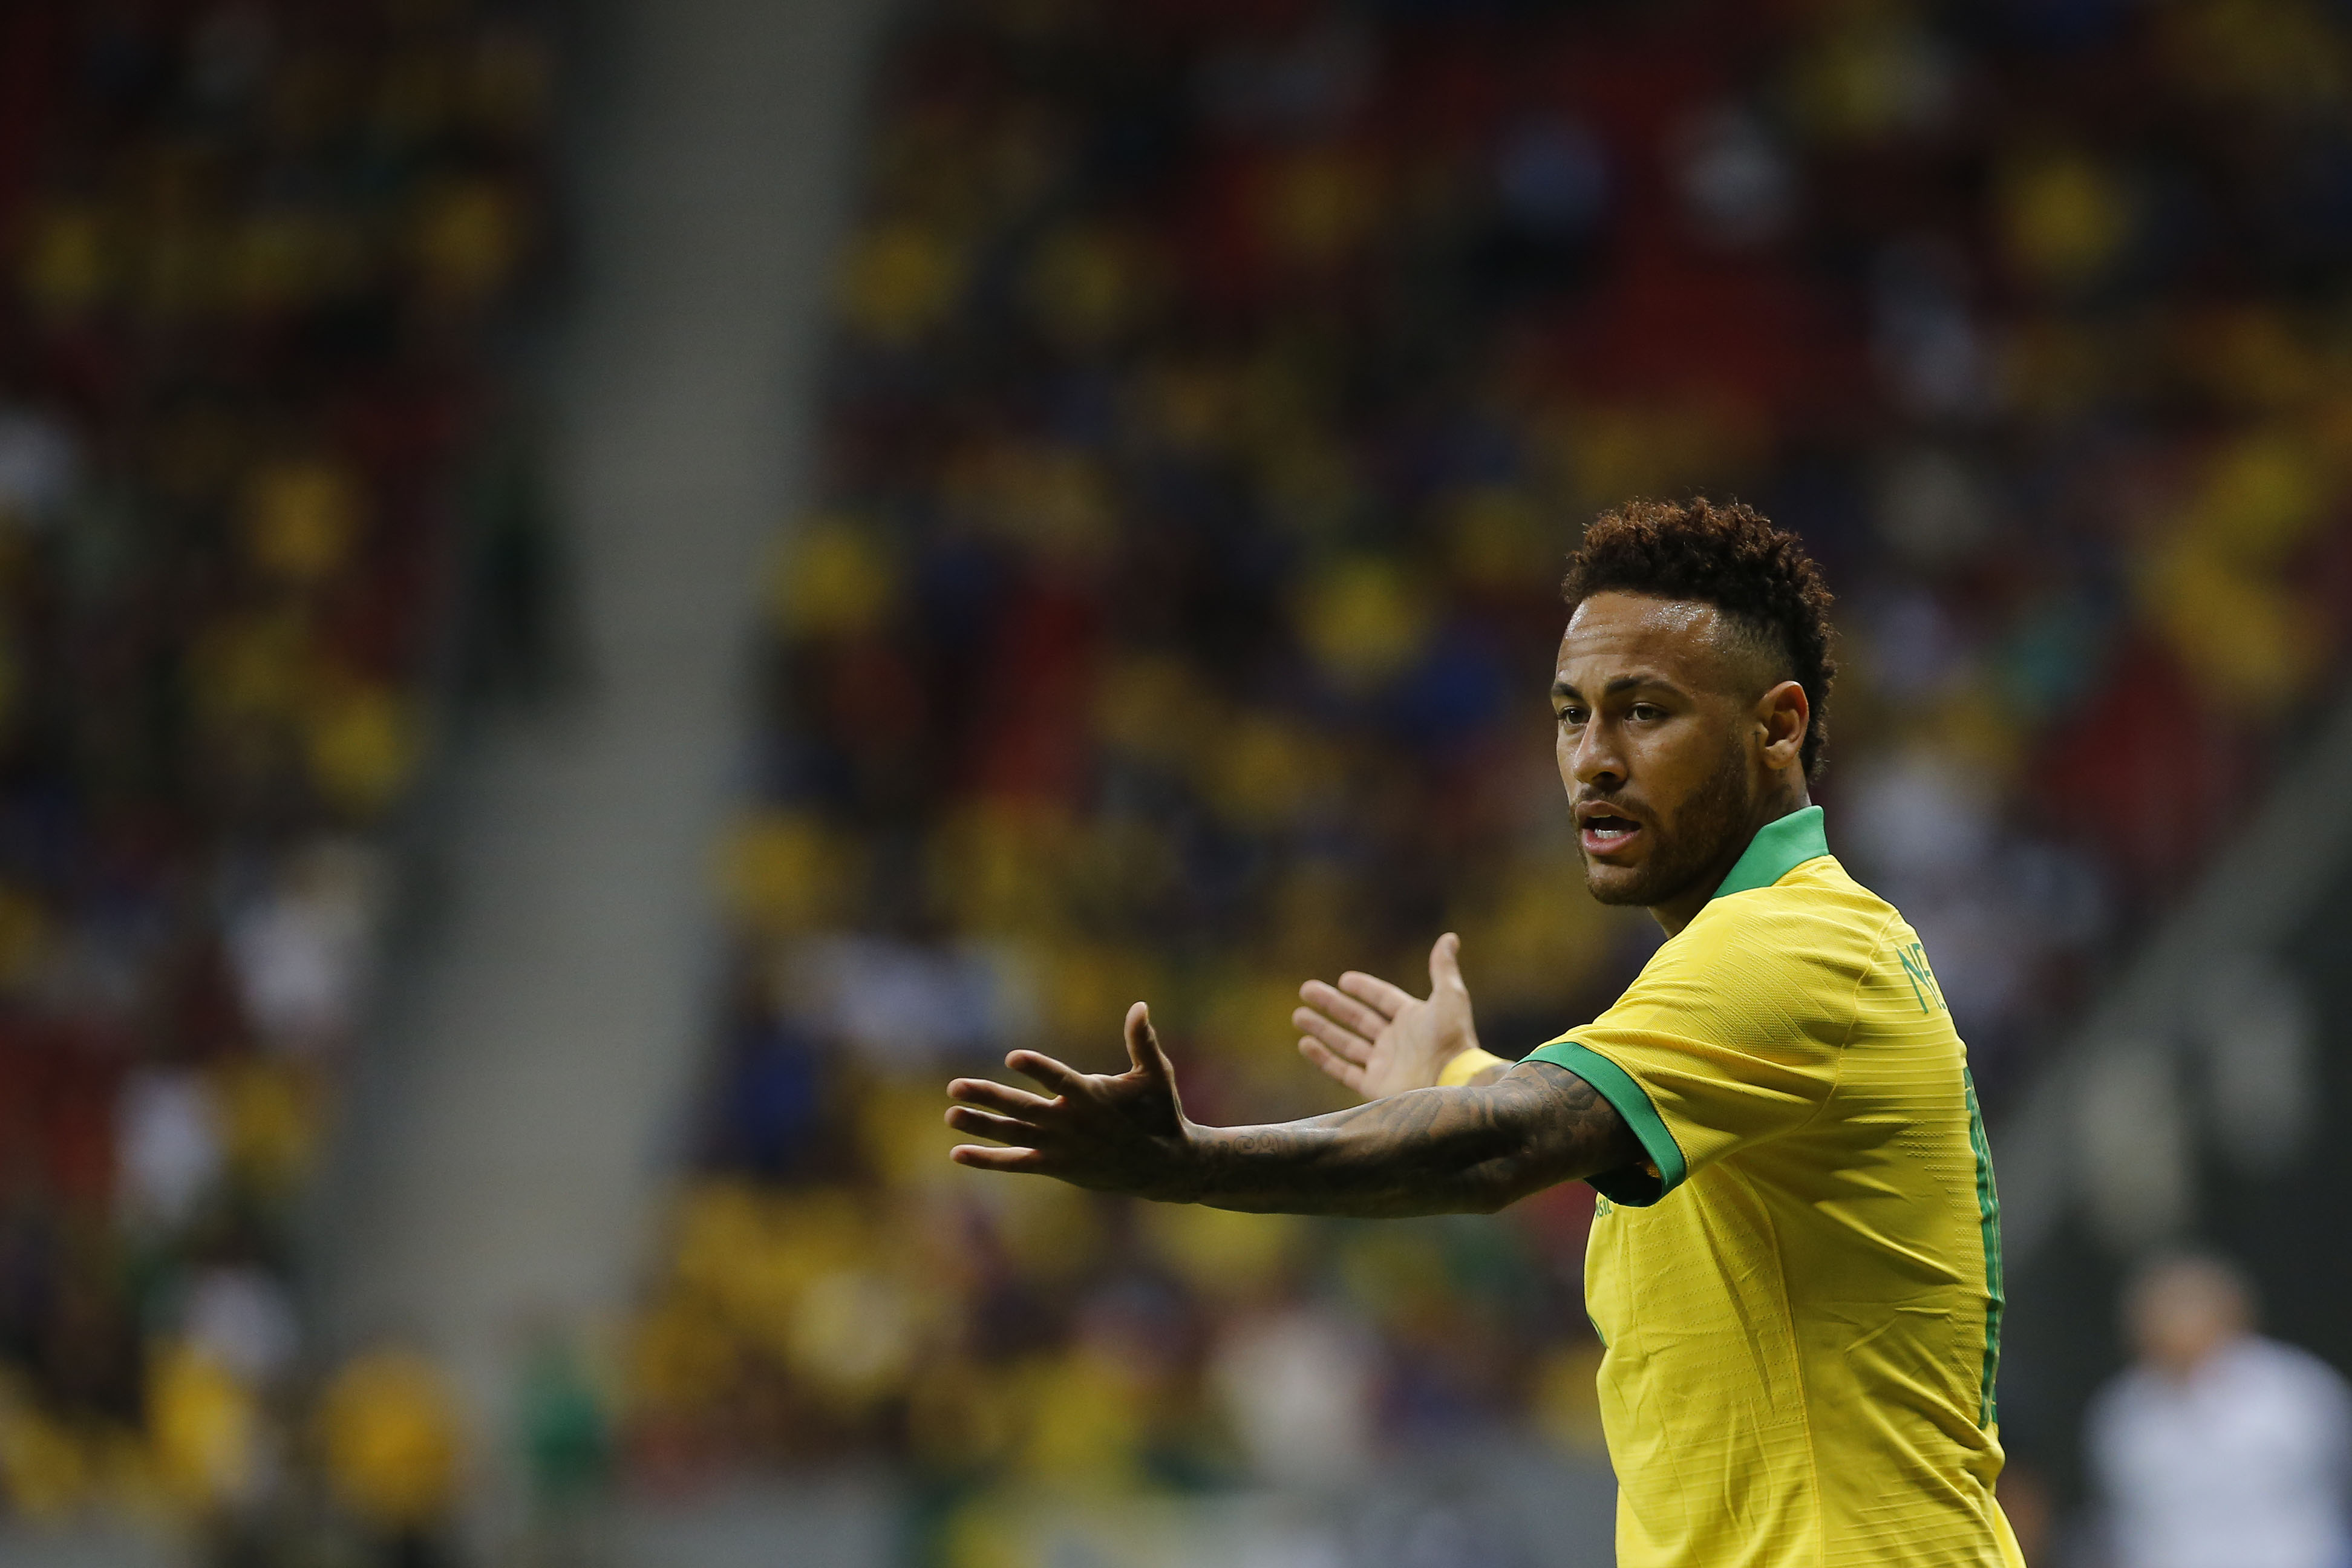 IMAGEM: Caso Neymar: advogado de Najila deixa de representá-la